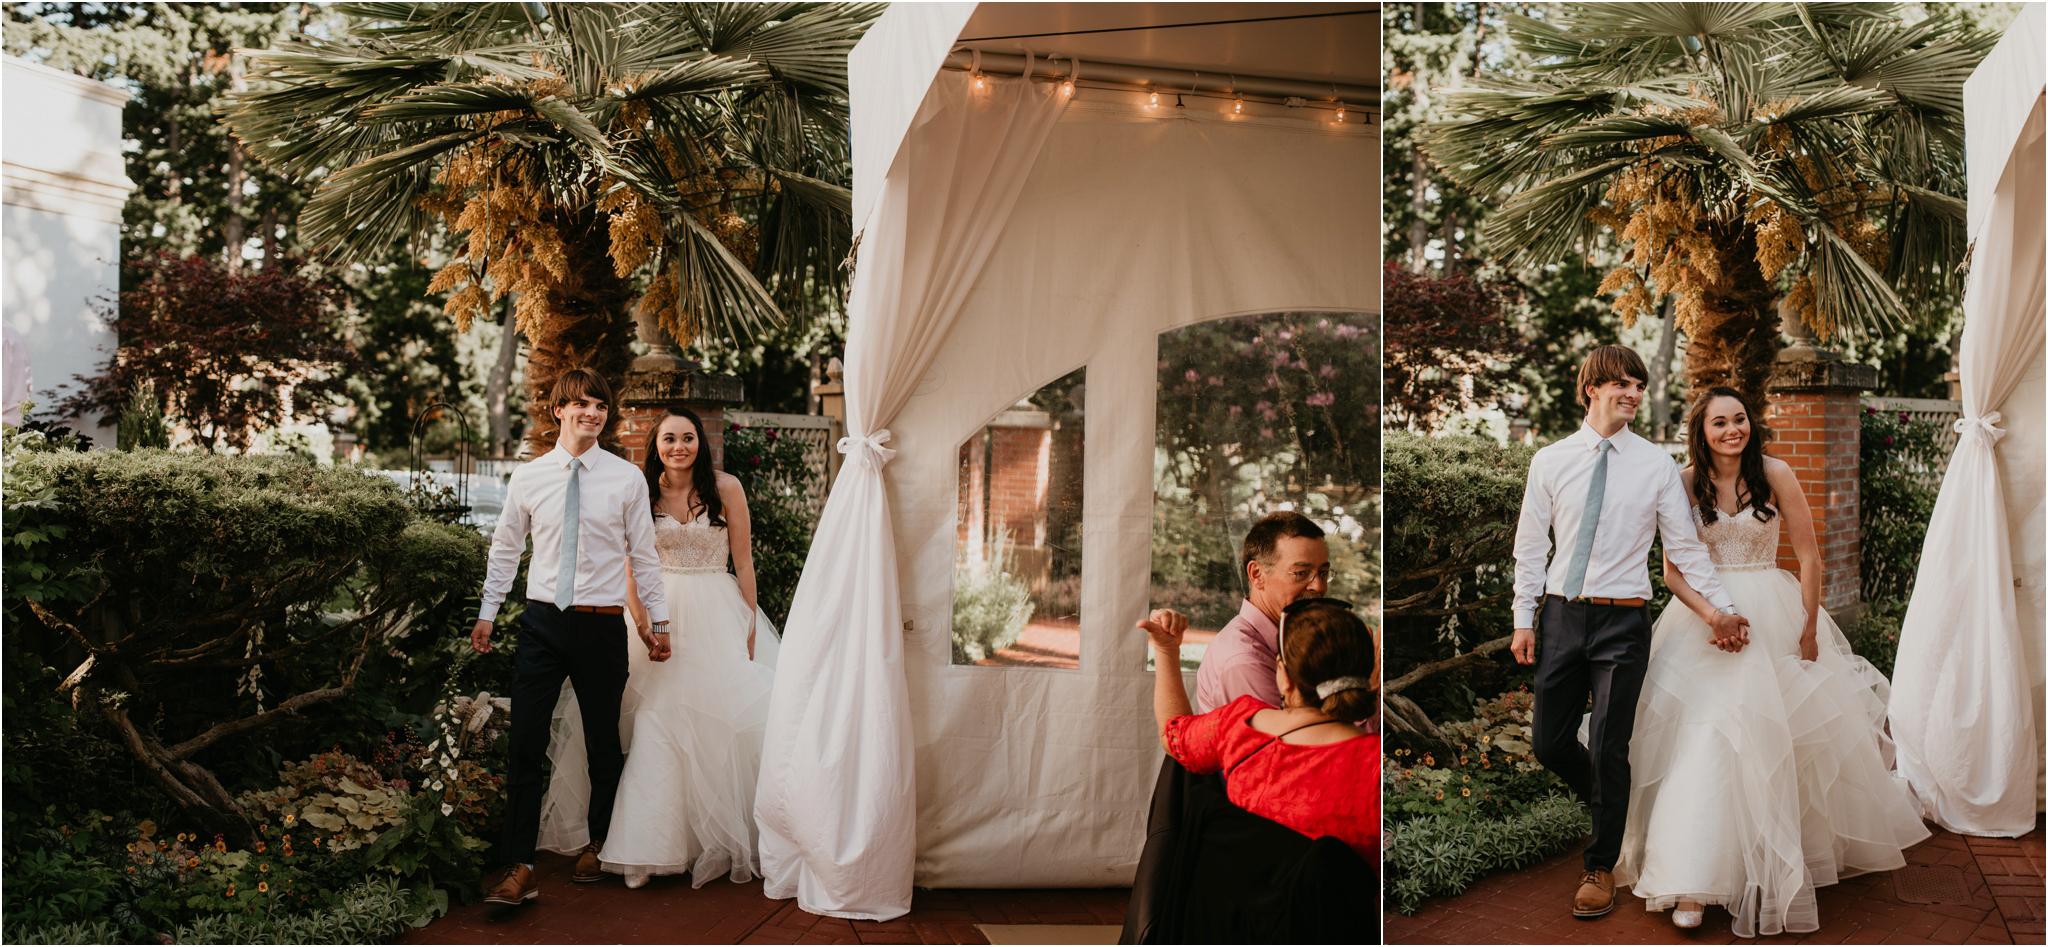 chance-and-ondrea-lairmont-manor-wedding-seattle-photographer-093.jpg